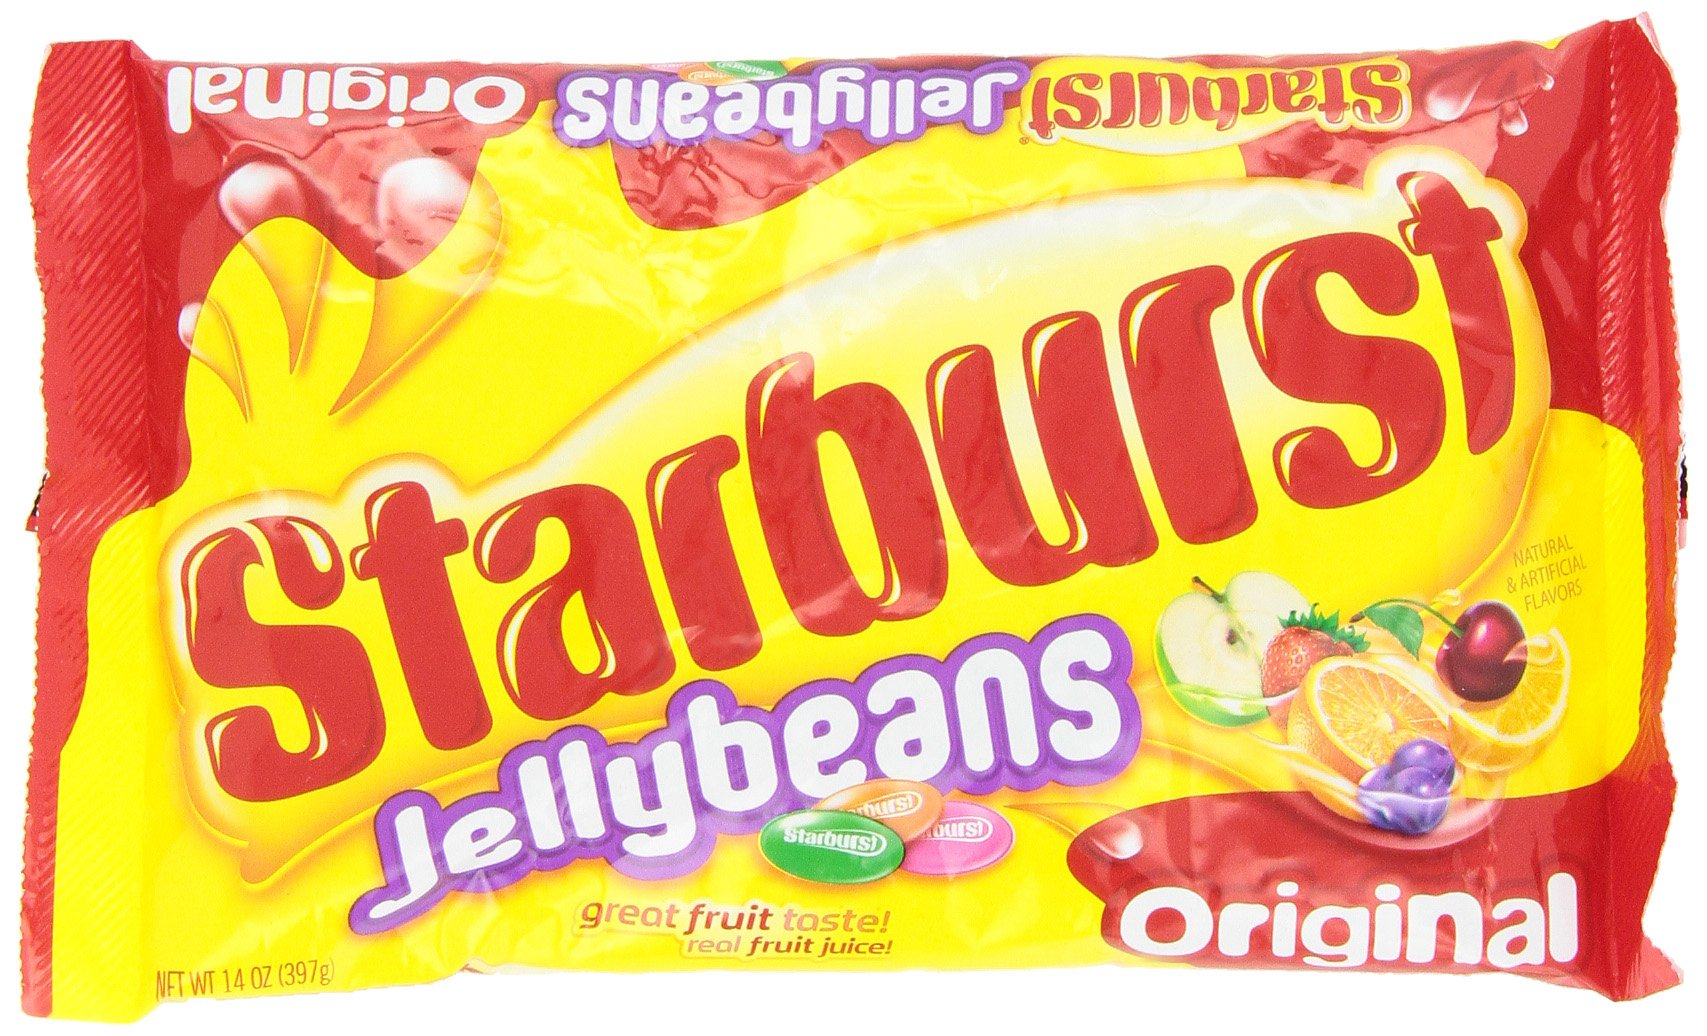 Starburst Jellybean Originals, 14 Ounce (Pack of 12)